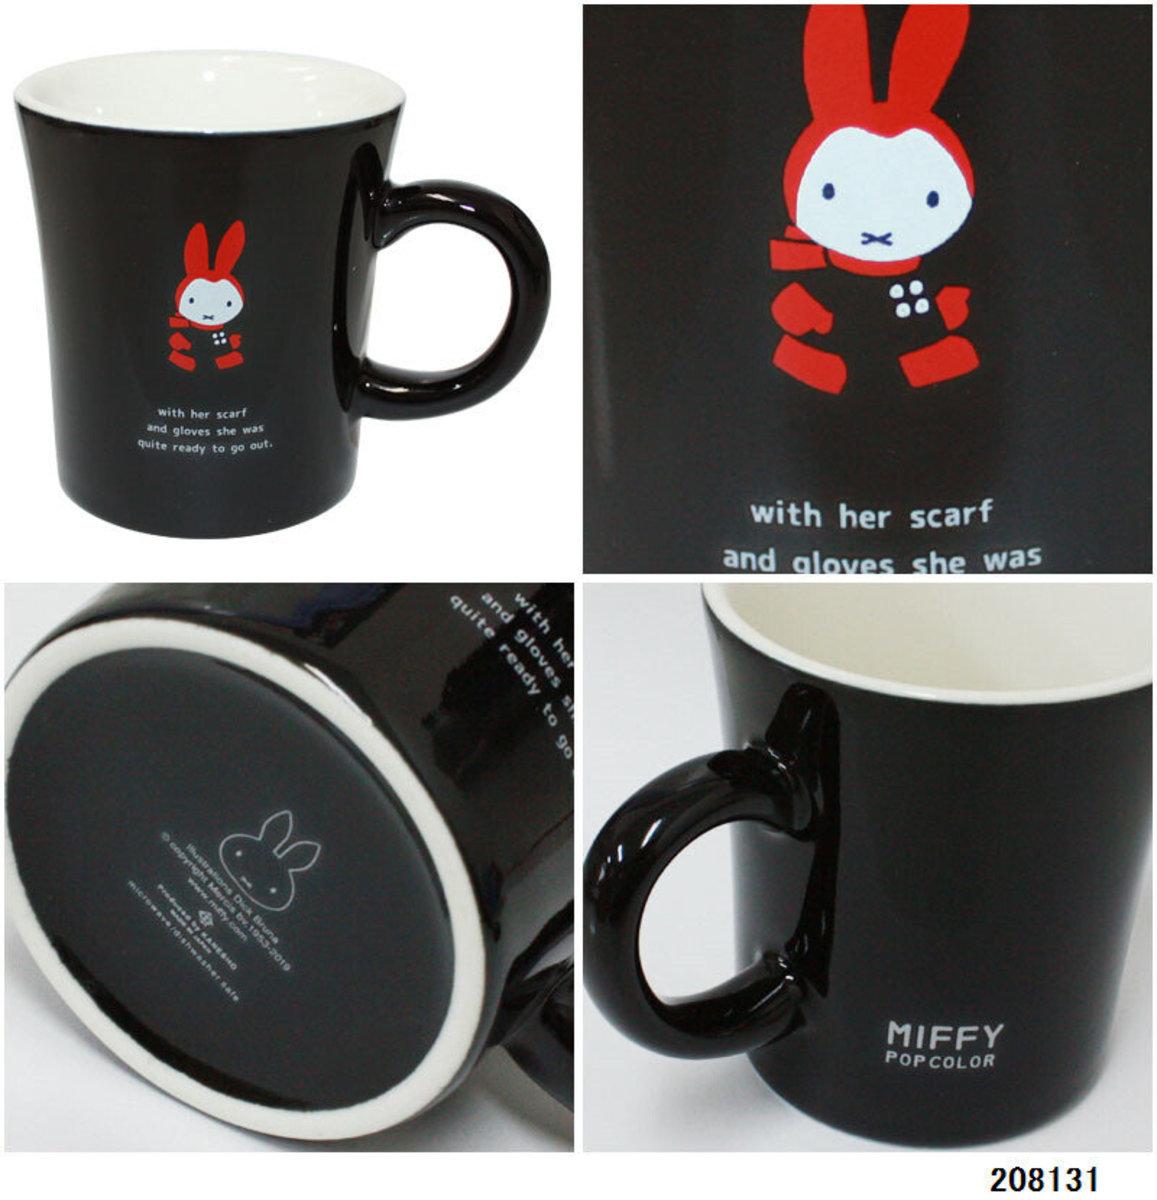 Made in Japan - Black Miffy Porcelain Coffee Mug